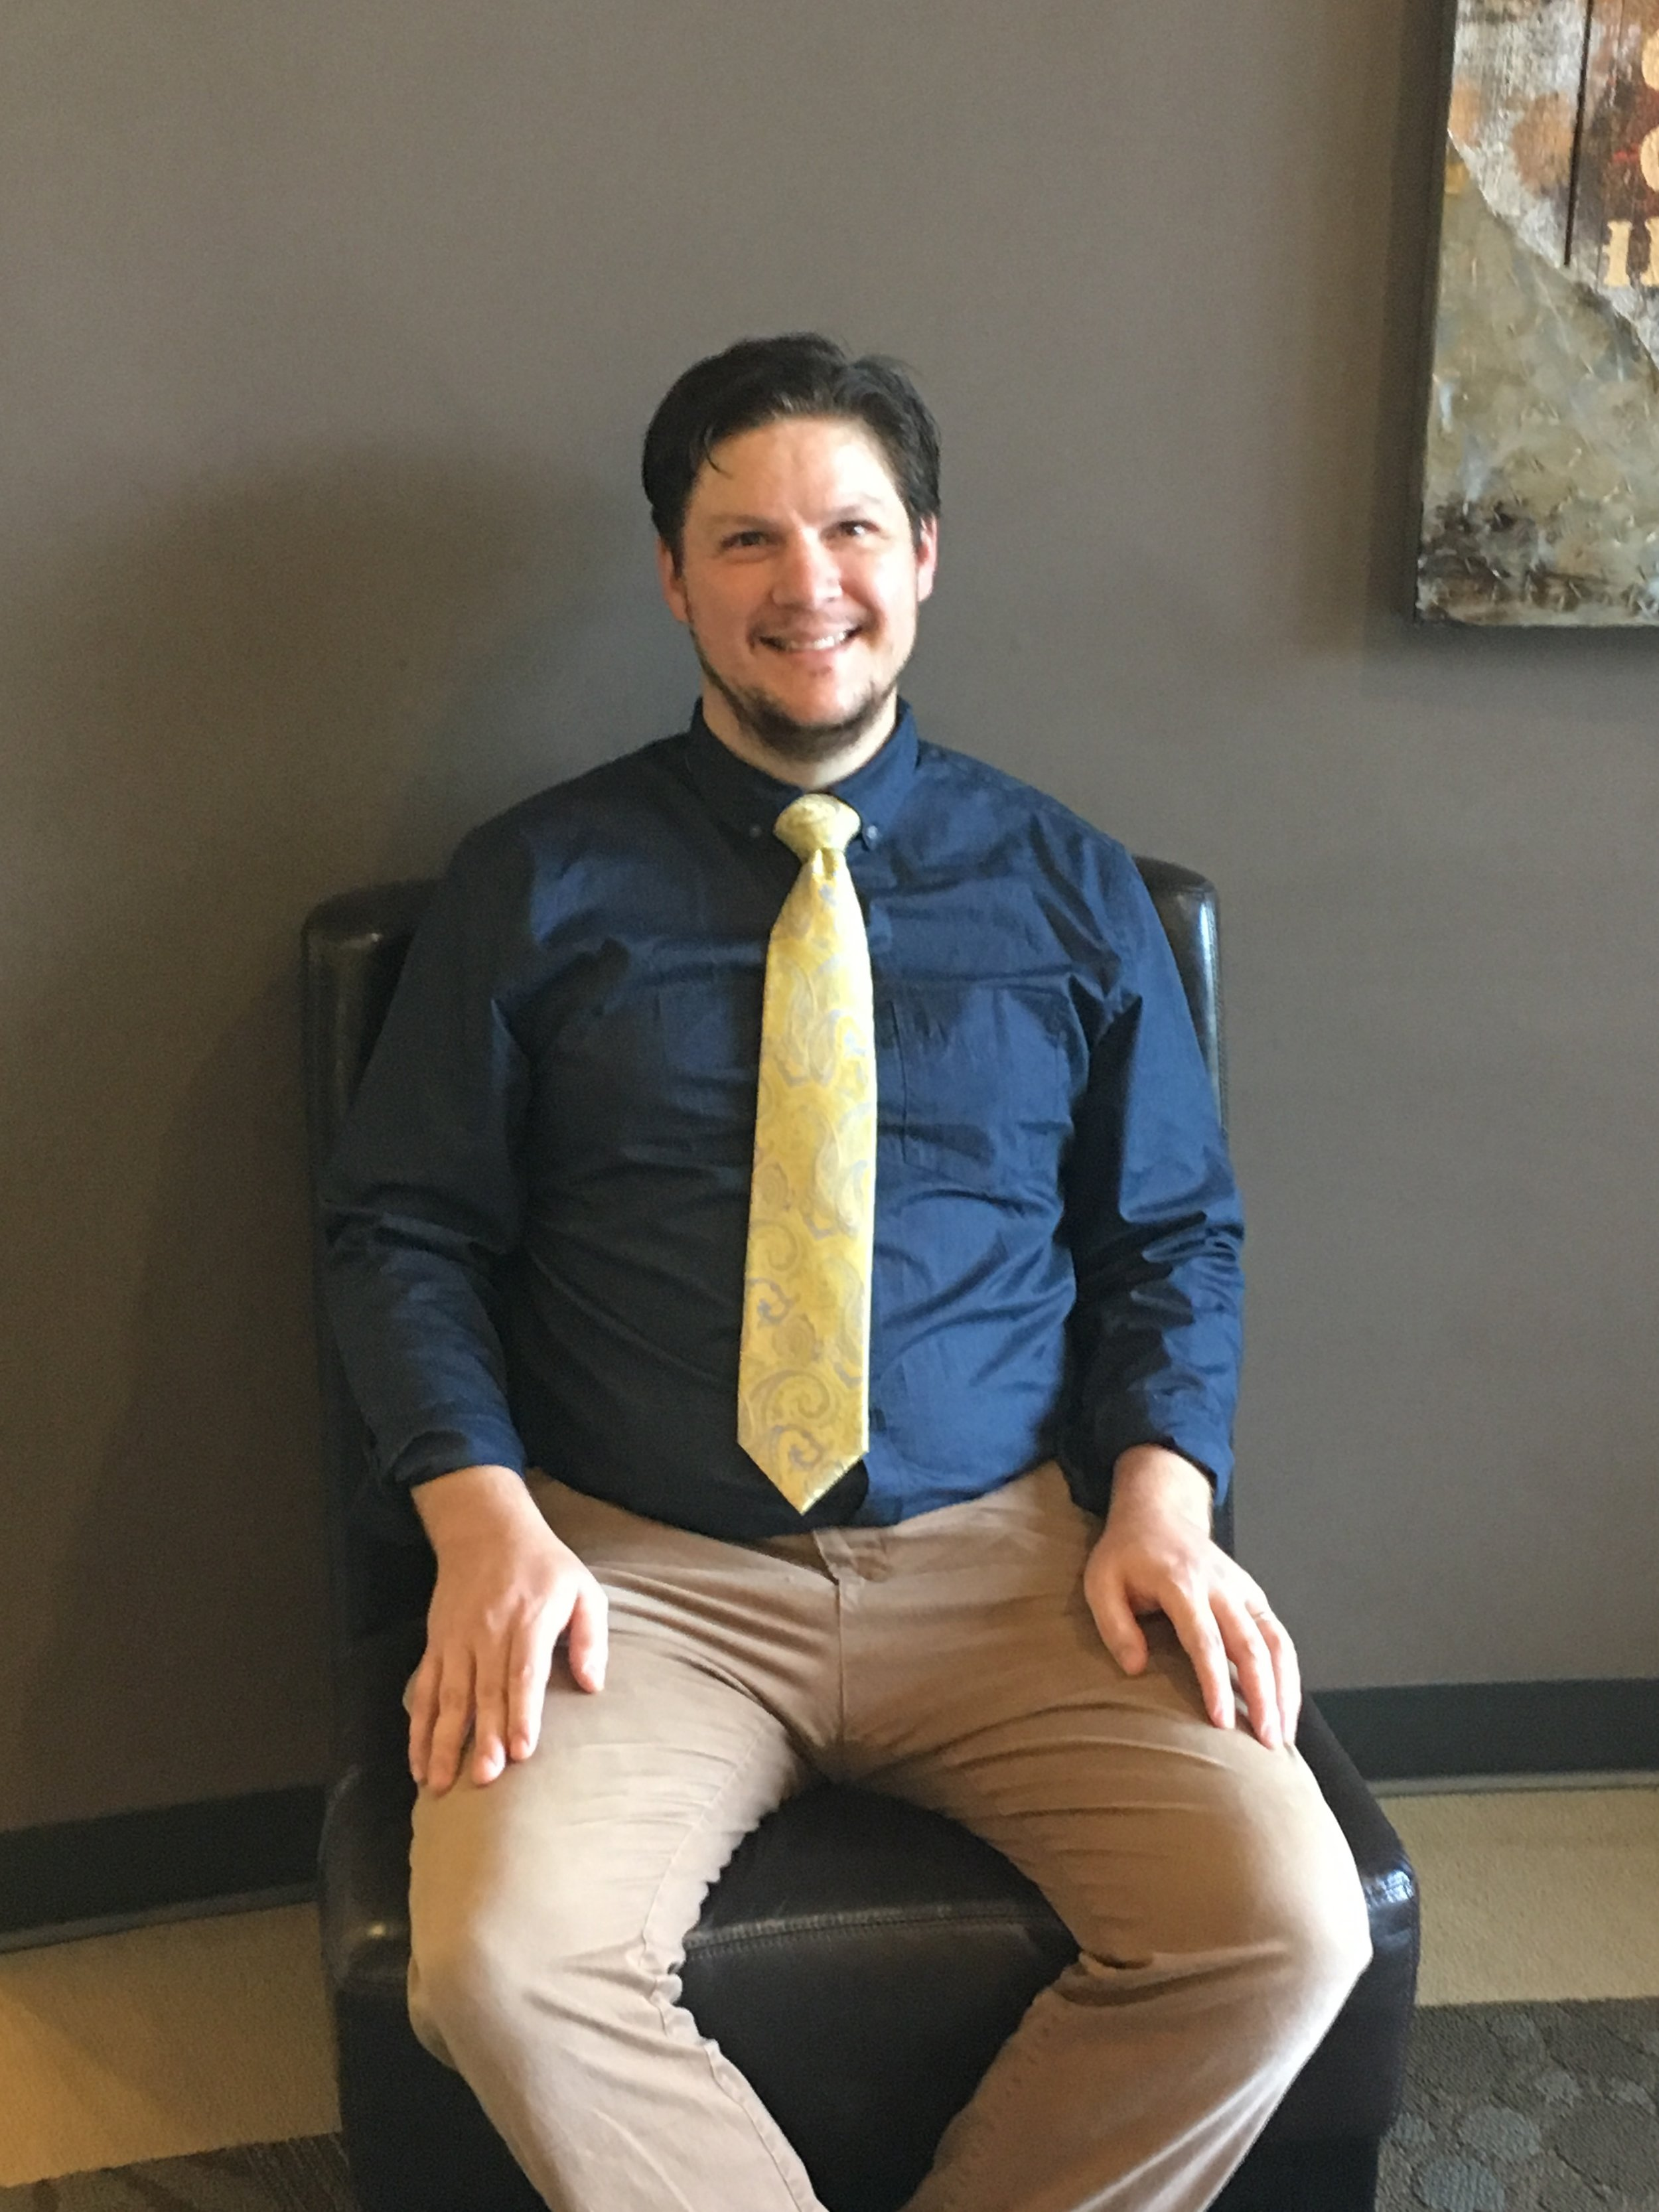 Stephen Vickery - Men's Ministry Coordinator